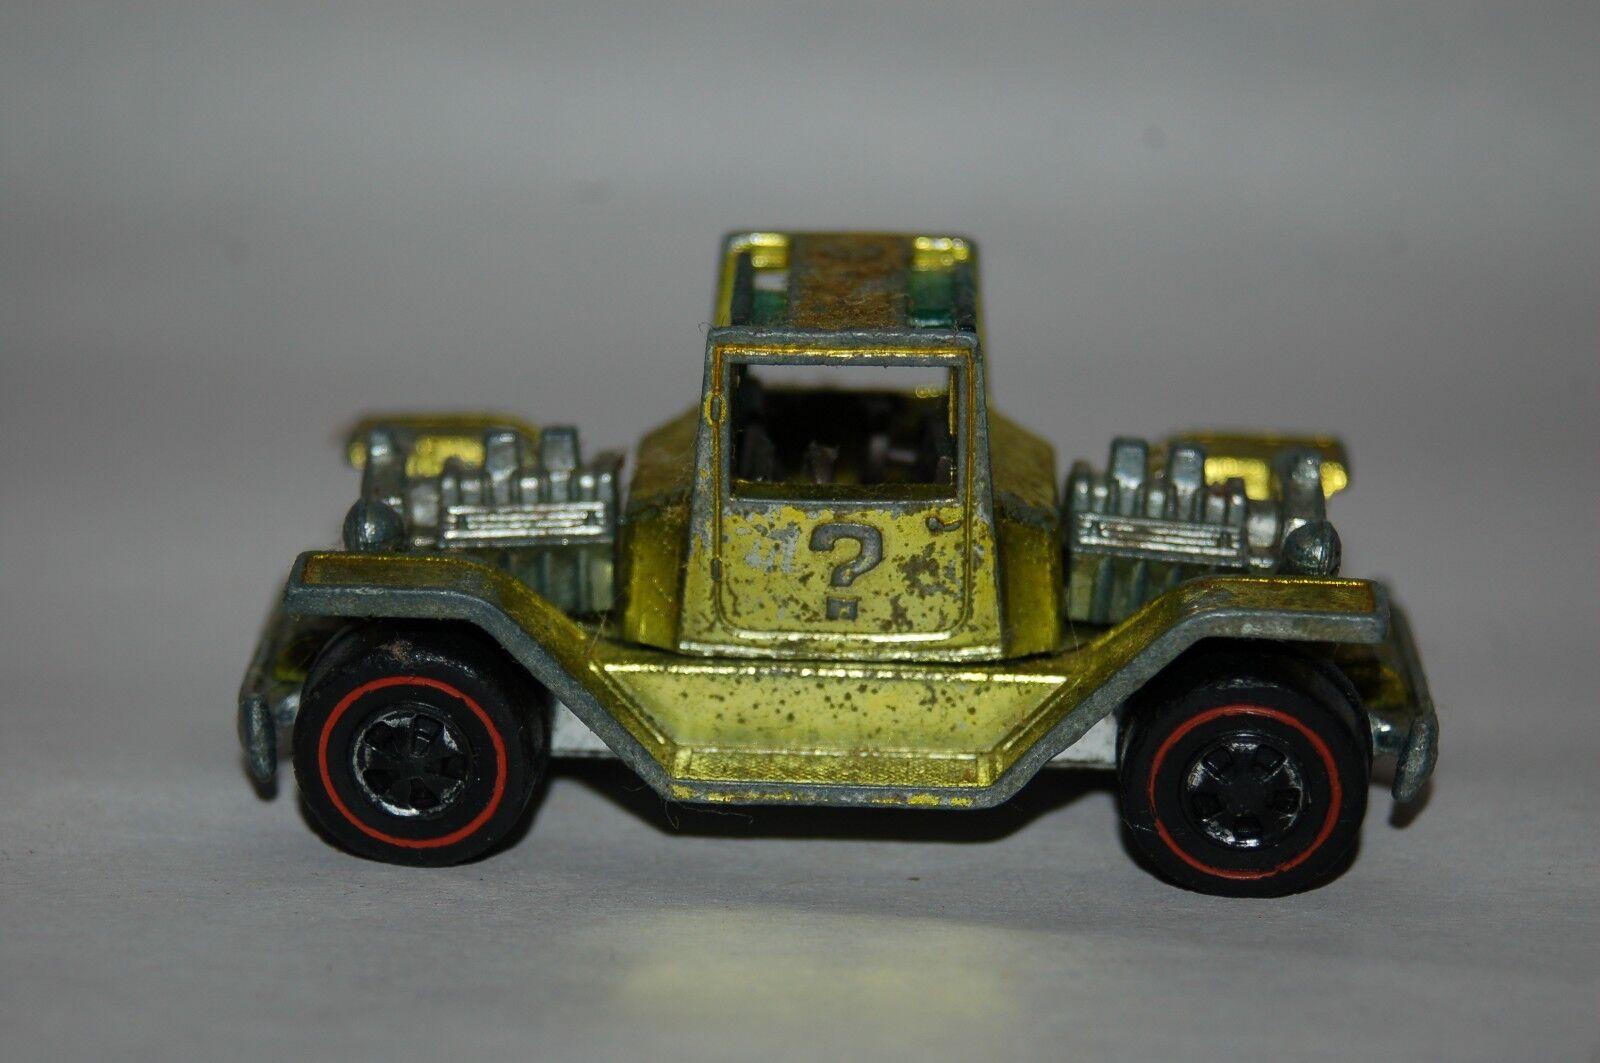 1971 Hot Wheels T-4-2 (gold)